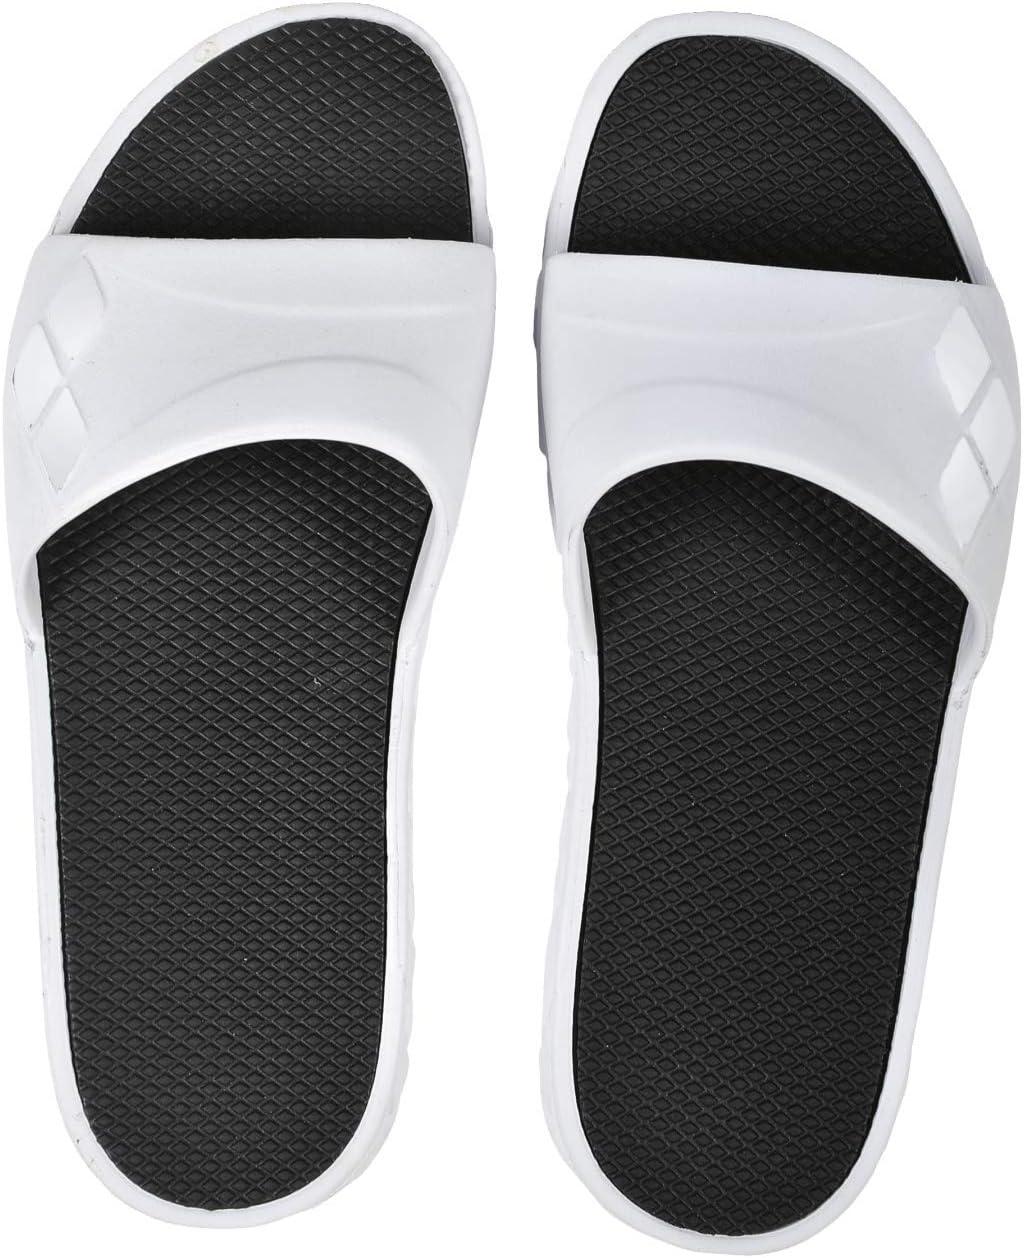 arena Women's Watergrip Slide Pool Sandals